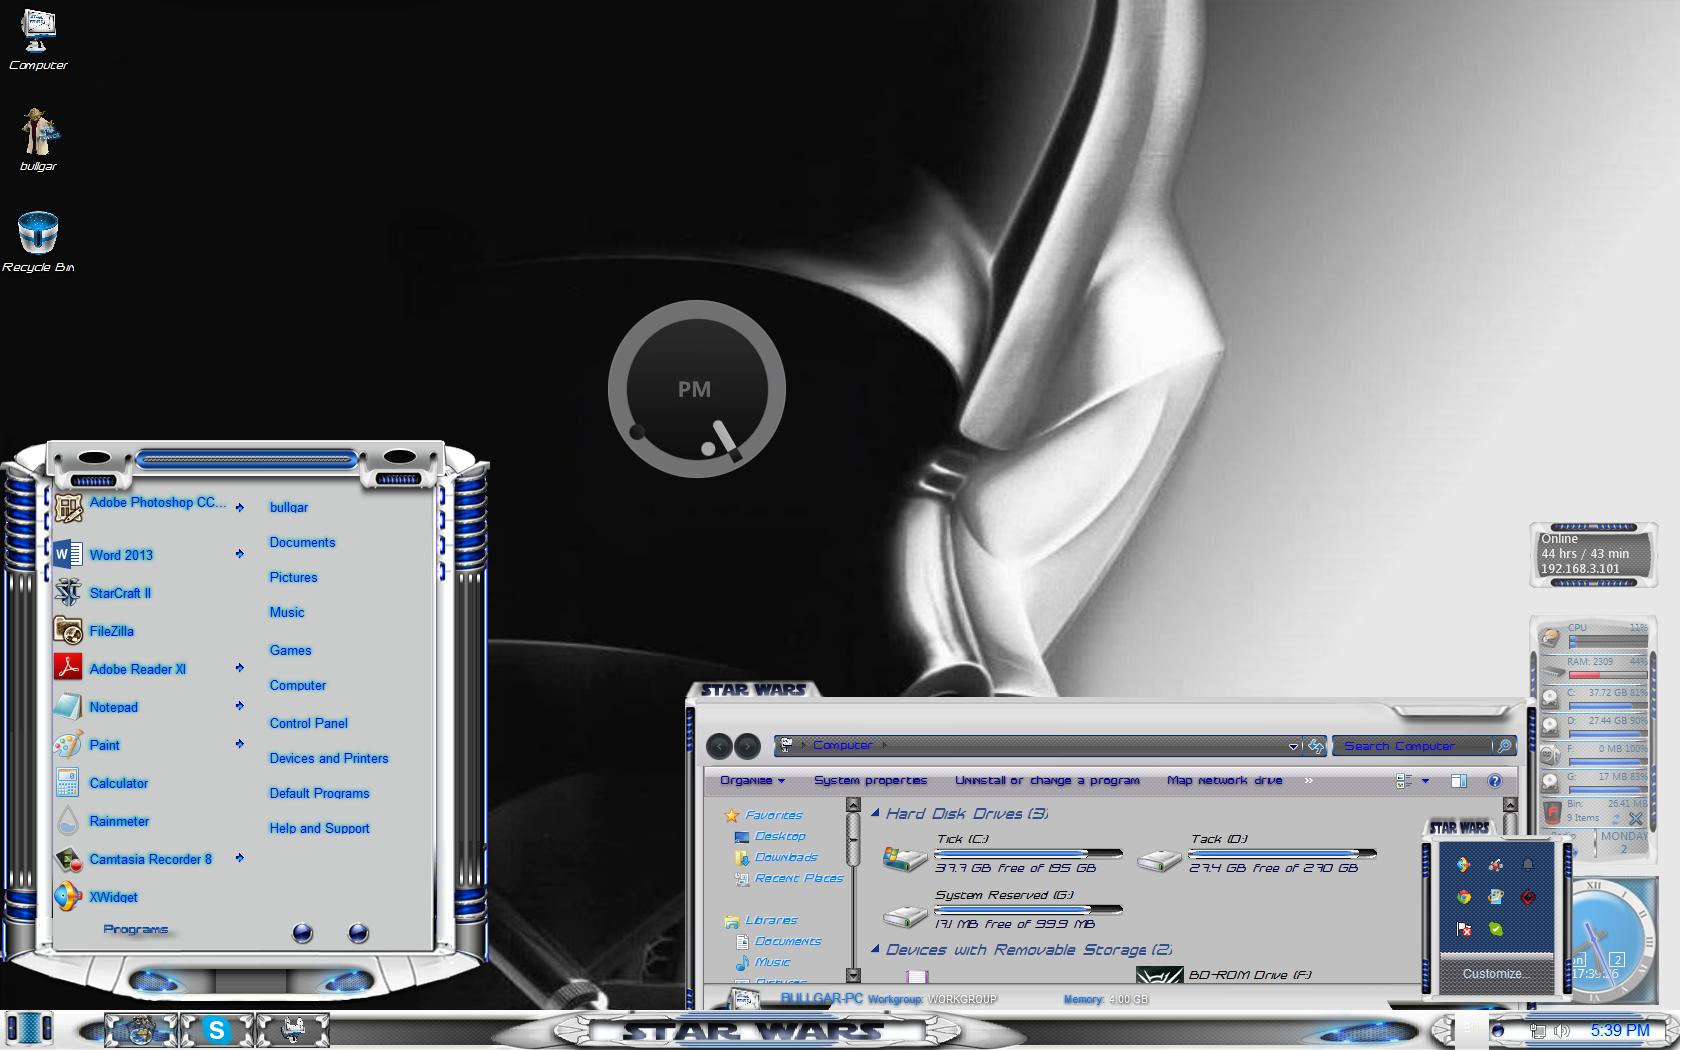 Star Wars Custom Windows 7 Theme Top windows 7 themes 1688x1050